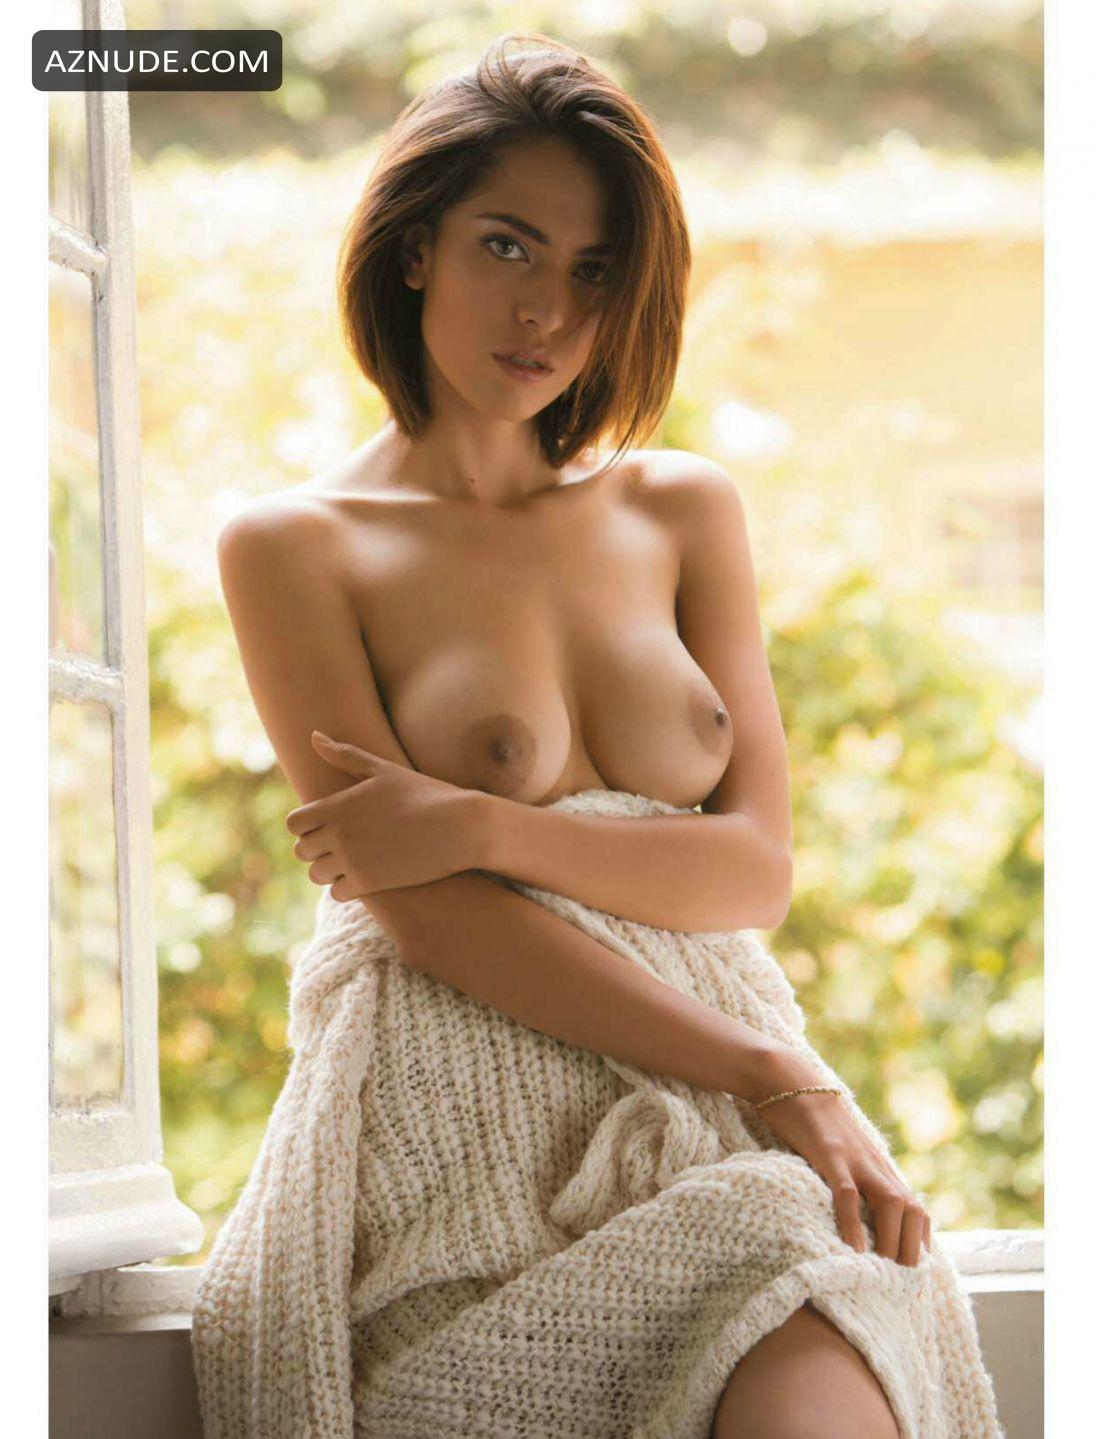 Alexandra Jimenez Tetas paula jimenez nude - aznude